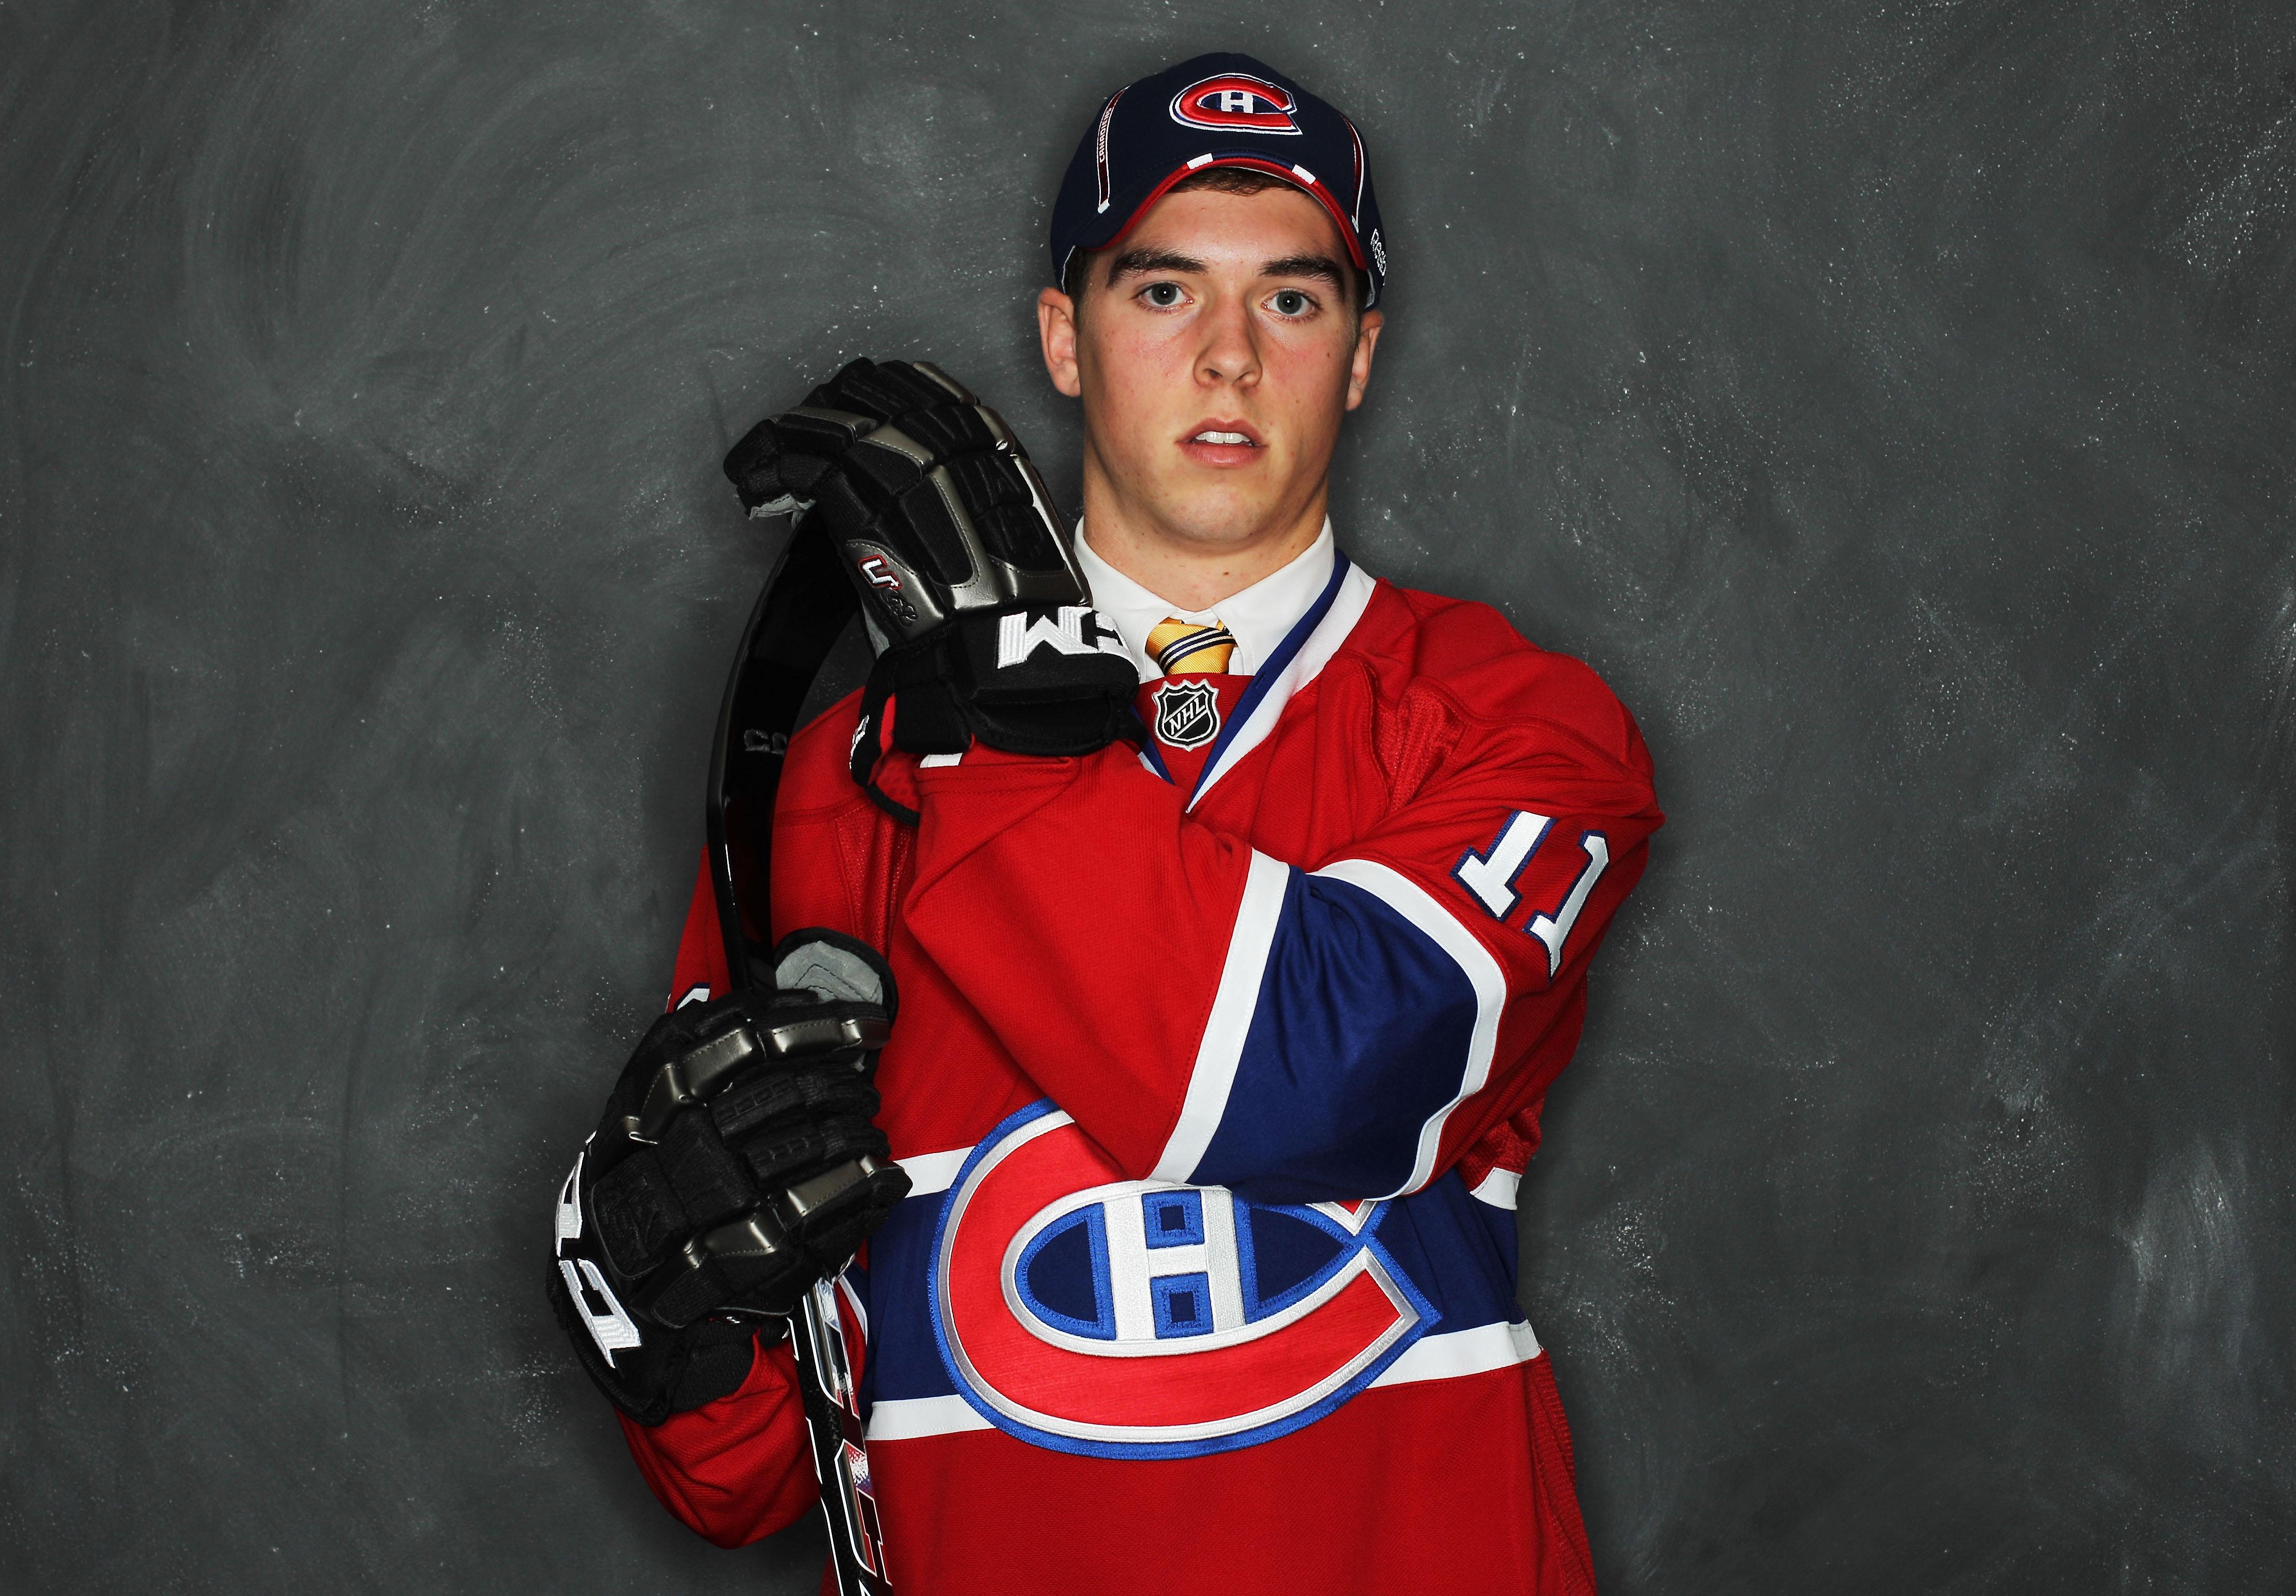 2011 NHL Entry Draft - Portraits